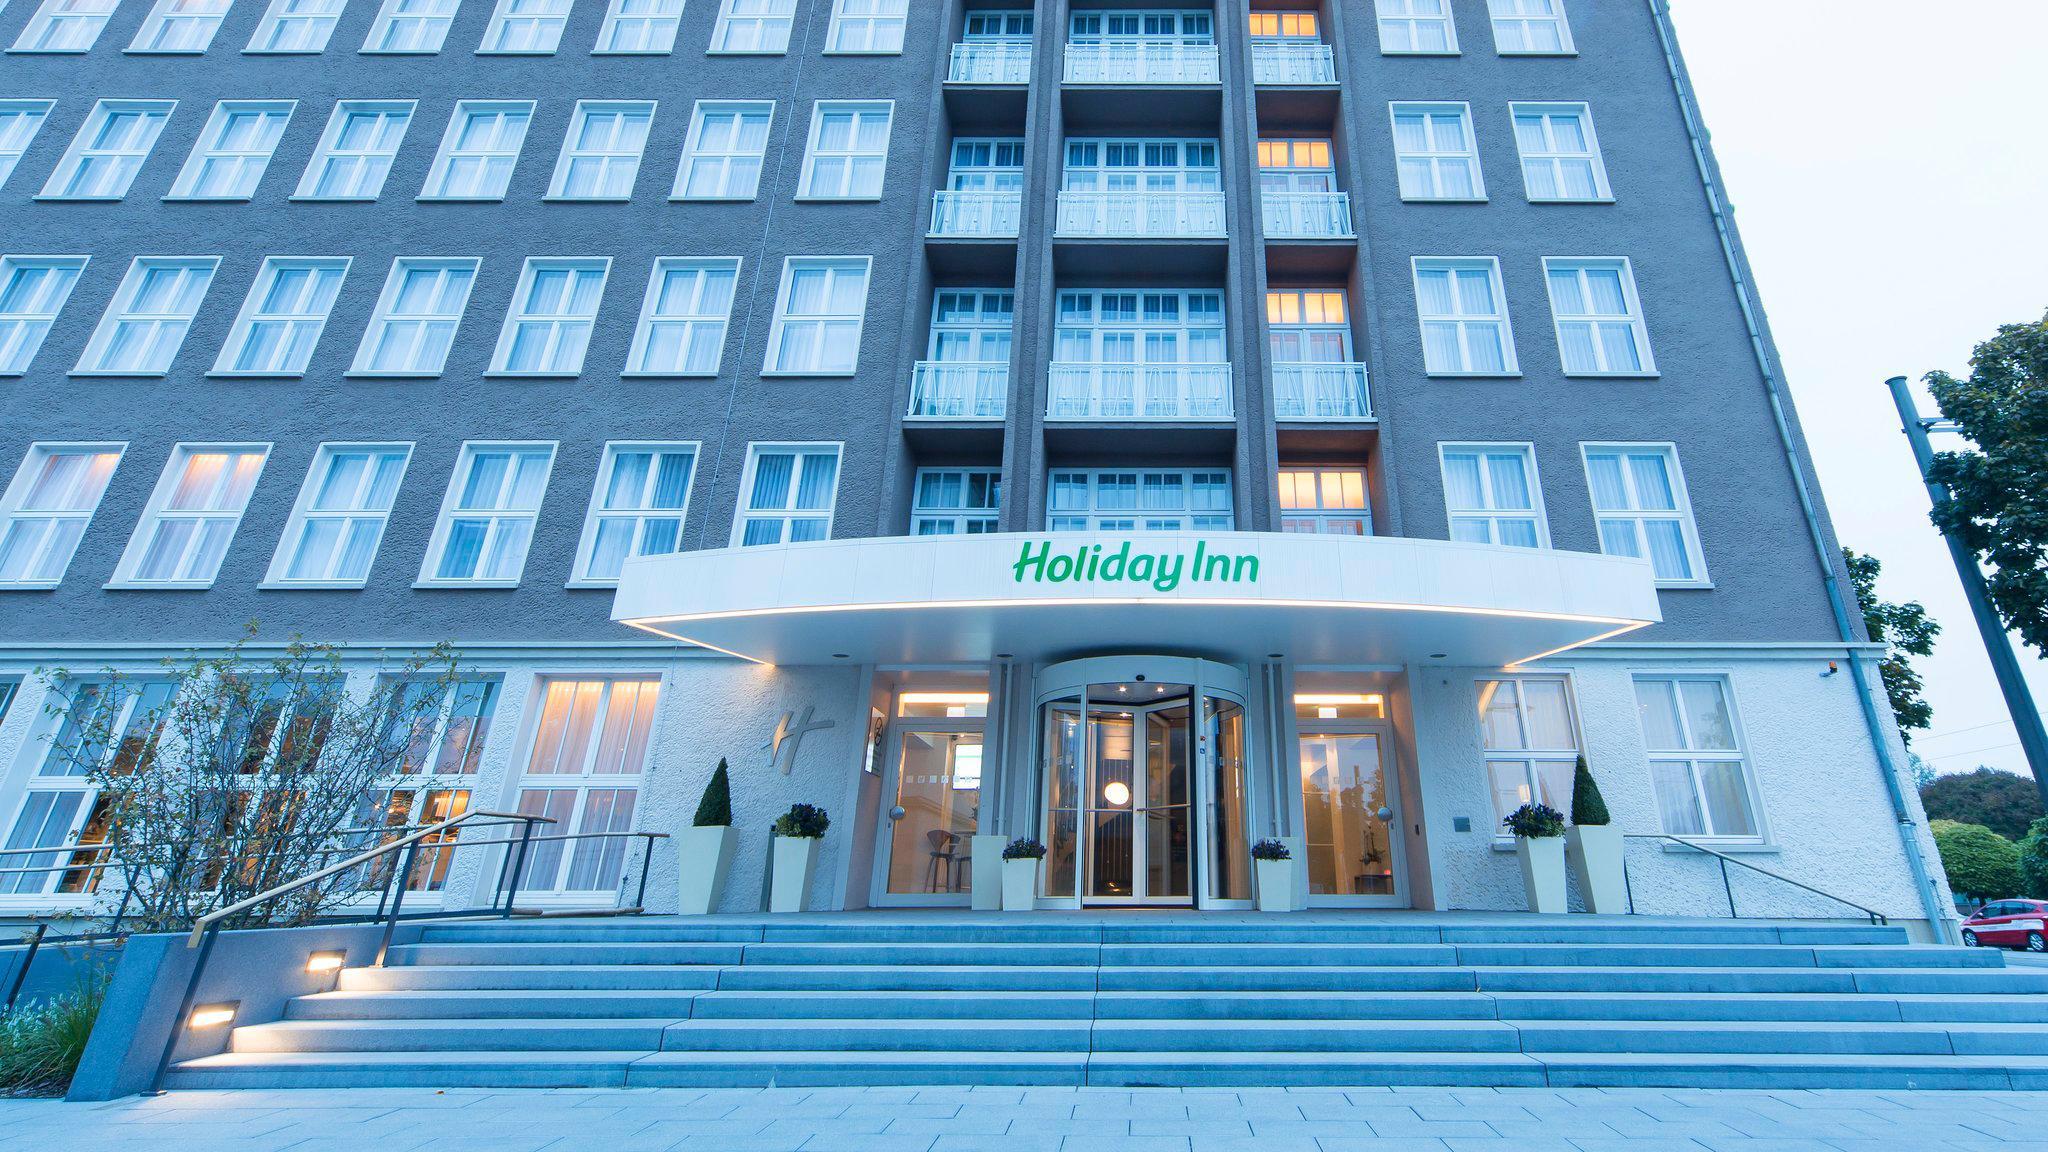 Holiday Inn Dresden - am Zwinger, Ostra-Allee 25 am Zwinger in Dresden